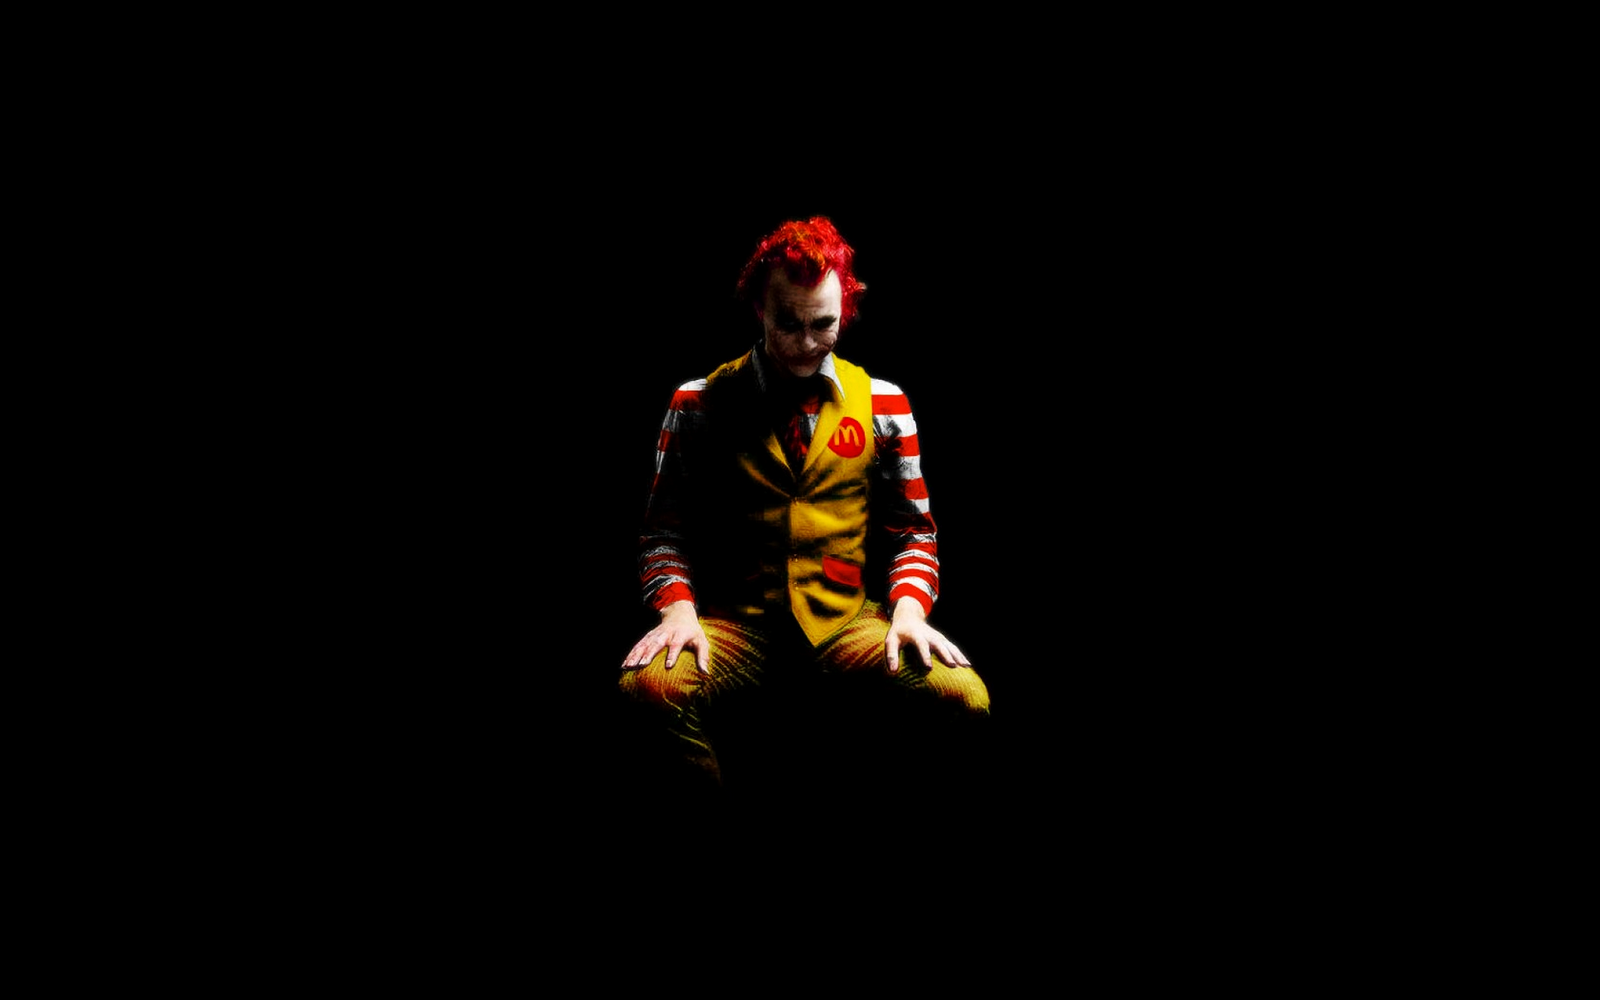 http://2.bp.blogspot.com/-nZW1pc0532o/T4xZ9aCMvlI/AAAAAAAABWk/Ua5ws-eK_pQ/s1600/Joker_With_McDonalds_Costume_in_Dark_HD_Wallpaper-Vvallpaper.Net.png